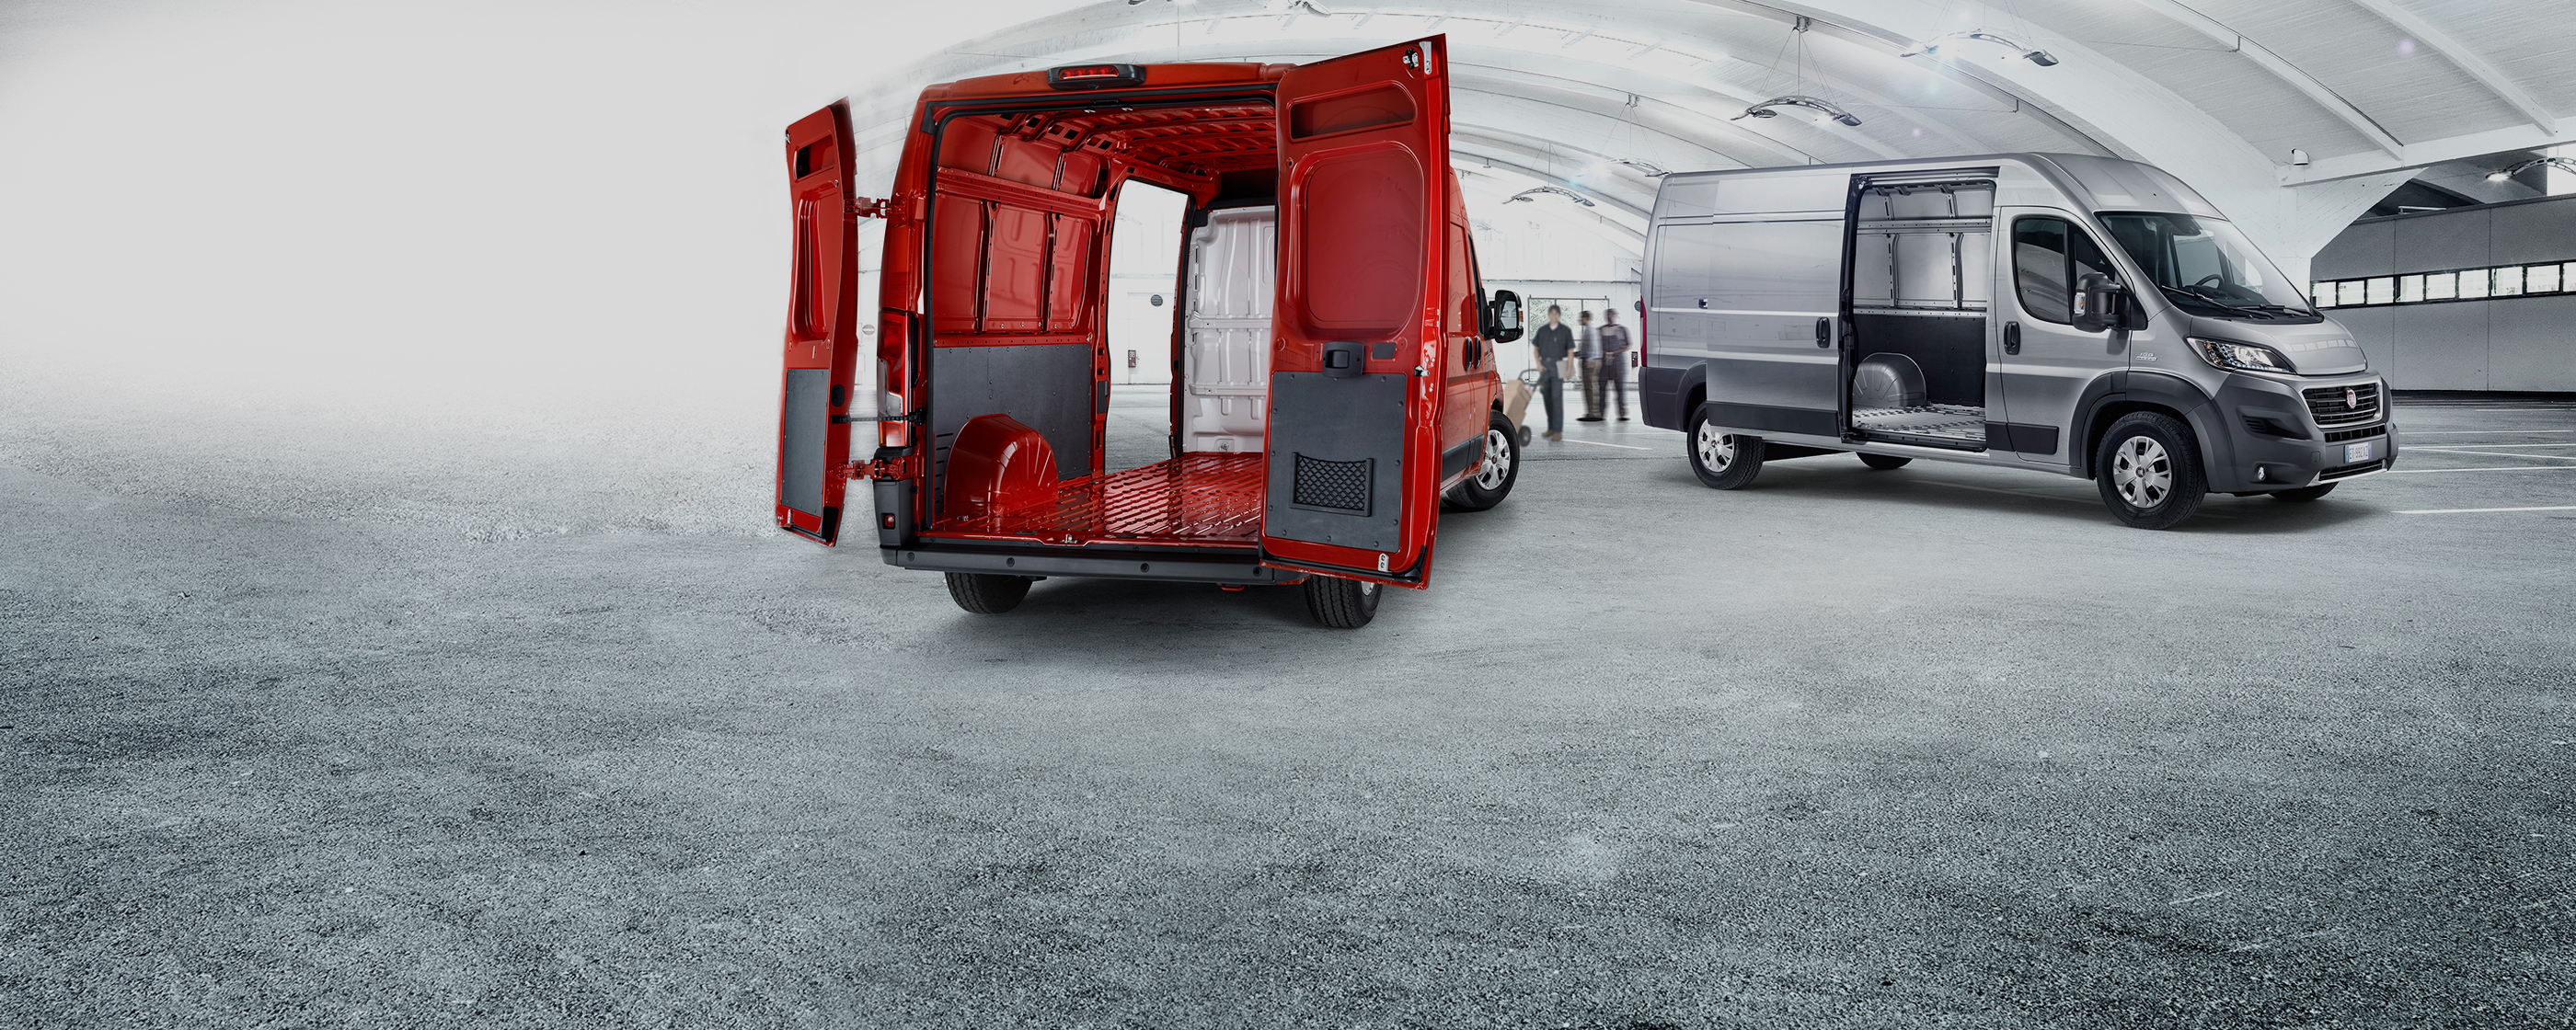 fiat transporter wohnmobil werkstatt in hamburg. Black Bedroom Furniture Sets. Home Design Ideas